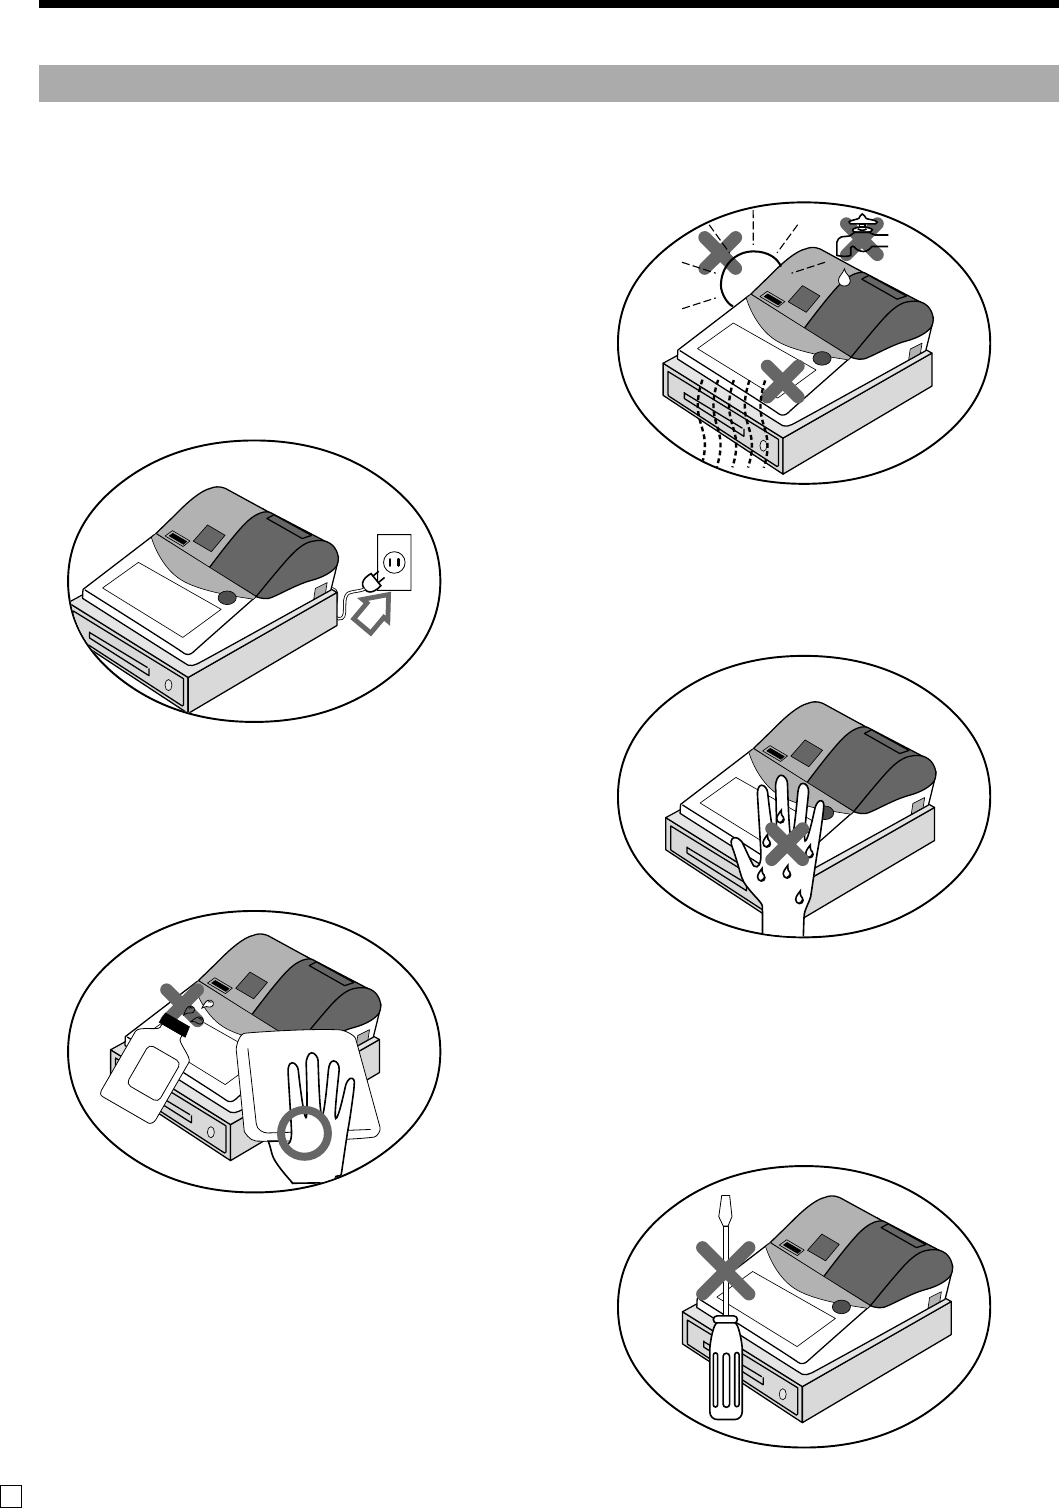 Casio User's Manual TE 2400 DE